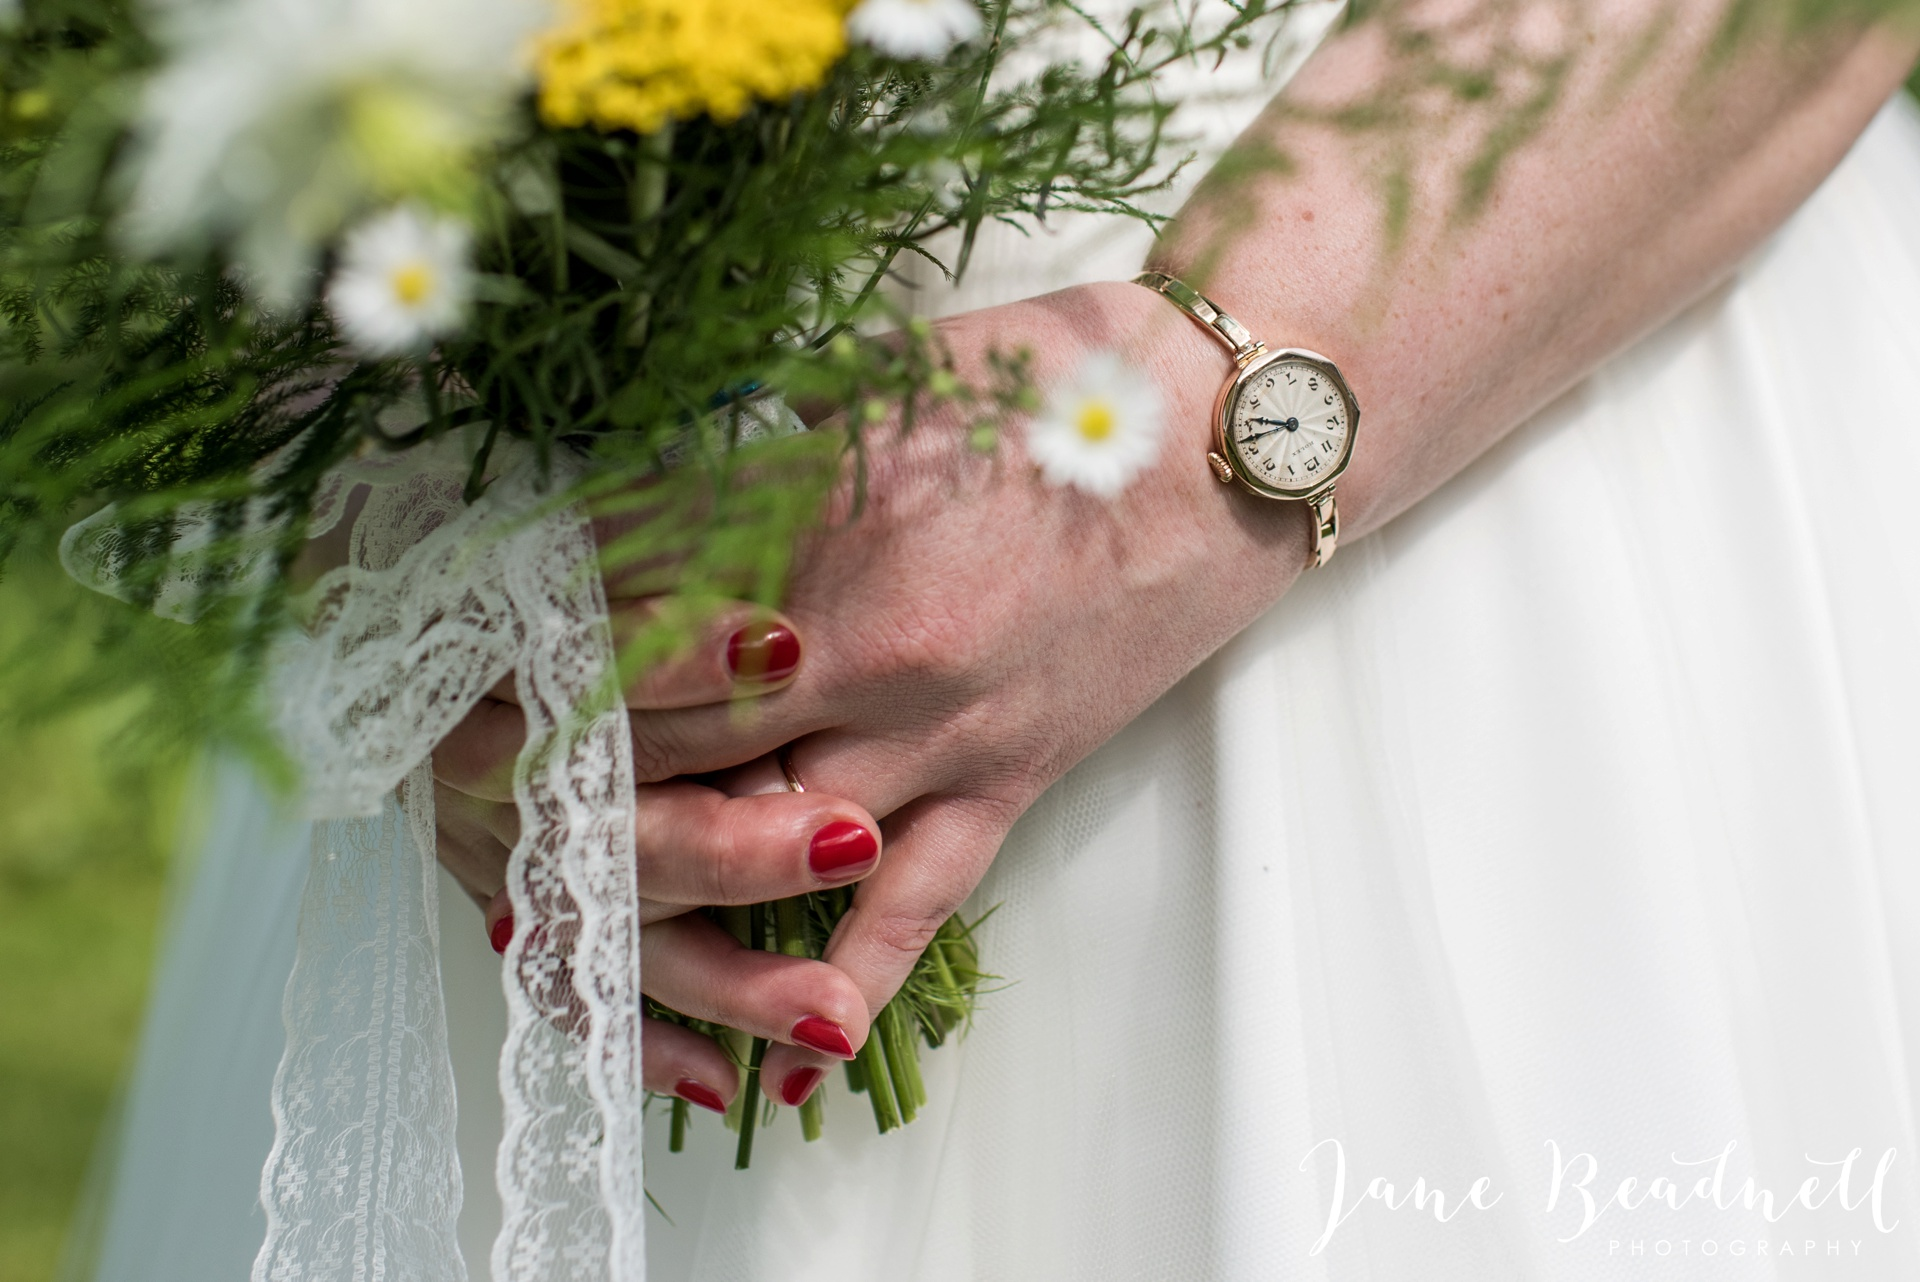 South Farm Wedding photography Hertfordshire by Jane Beadnell Photography fine art wedding photographer_0095